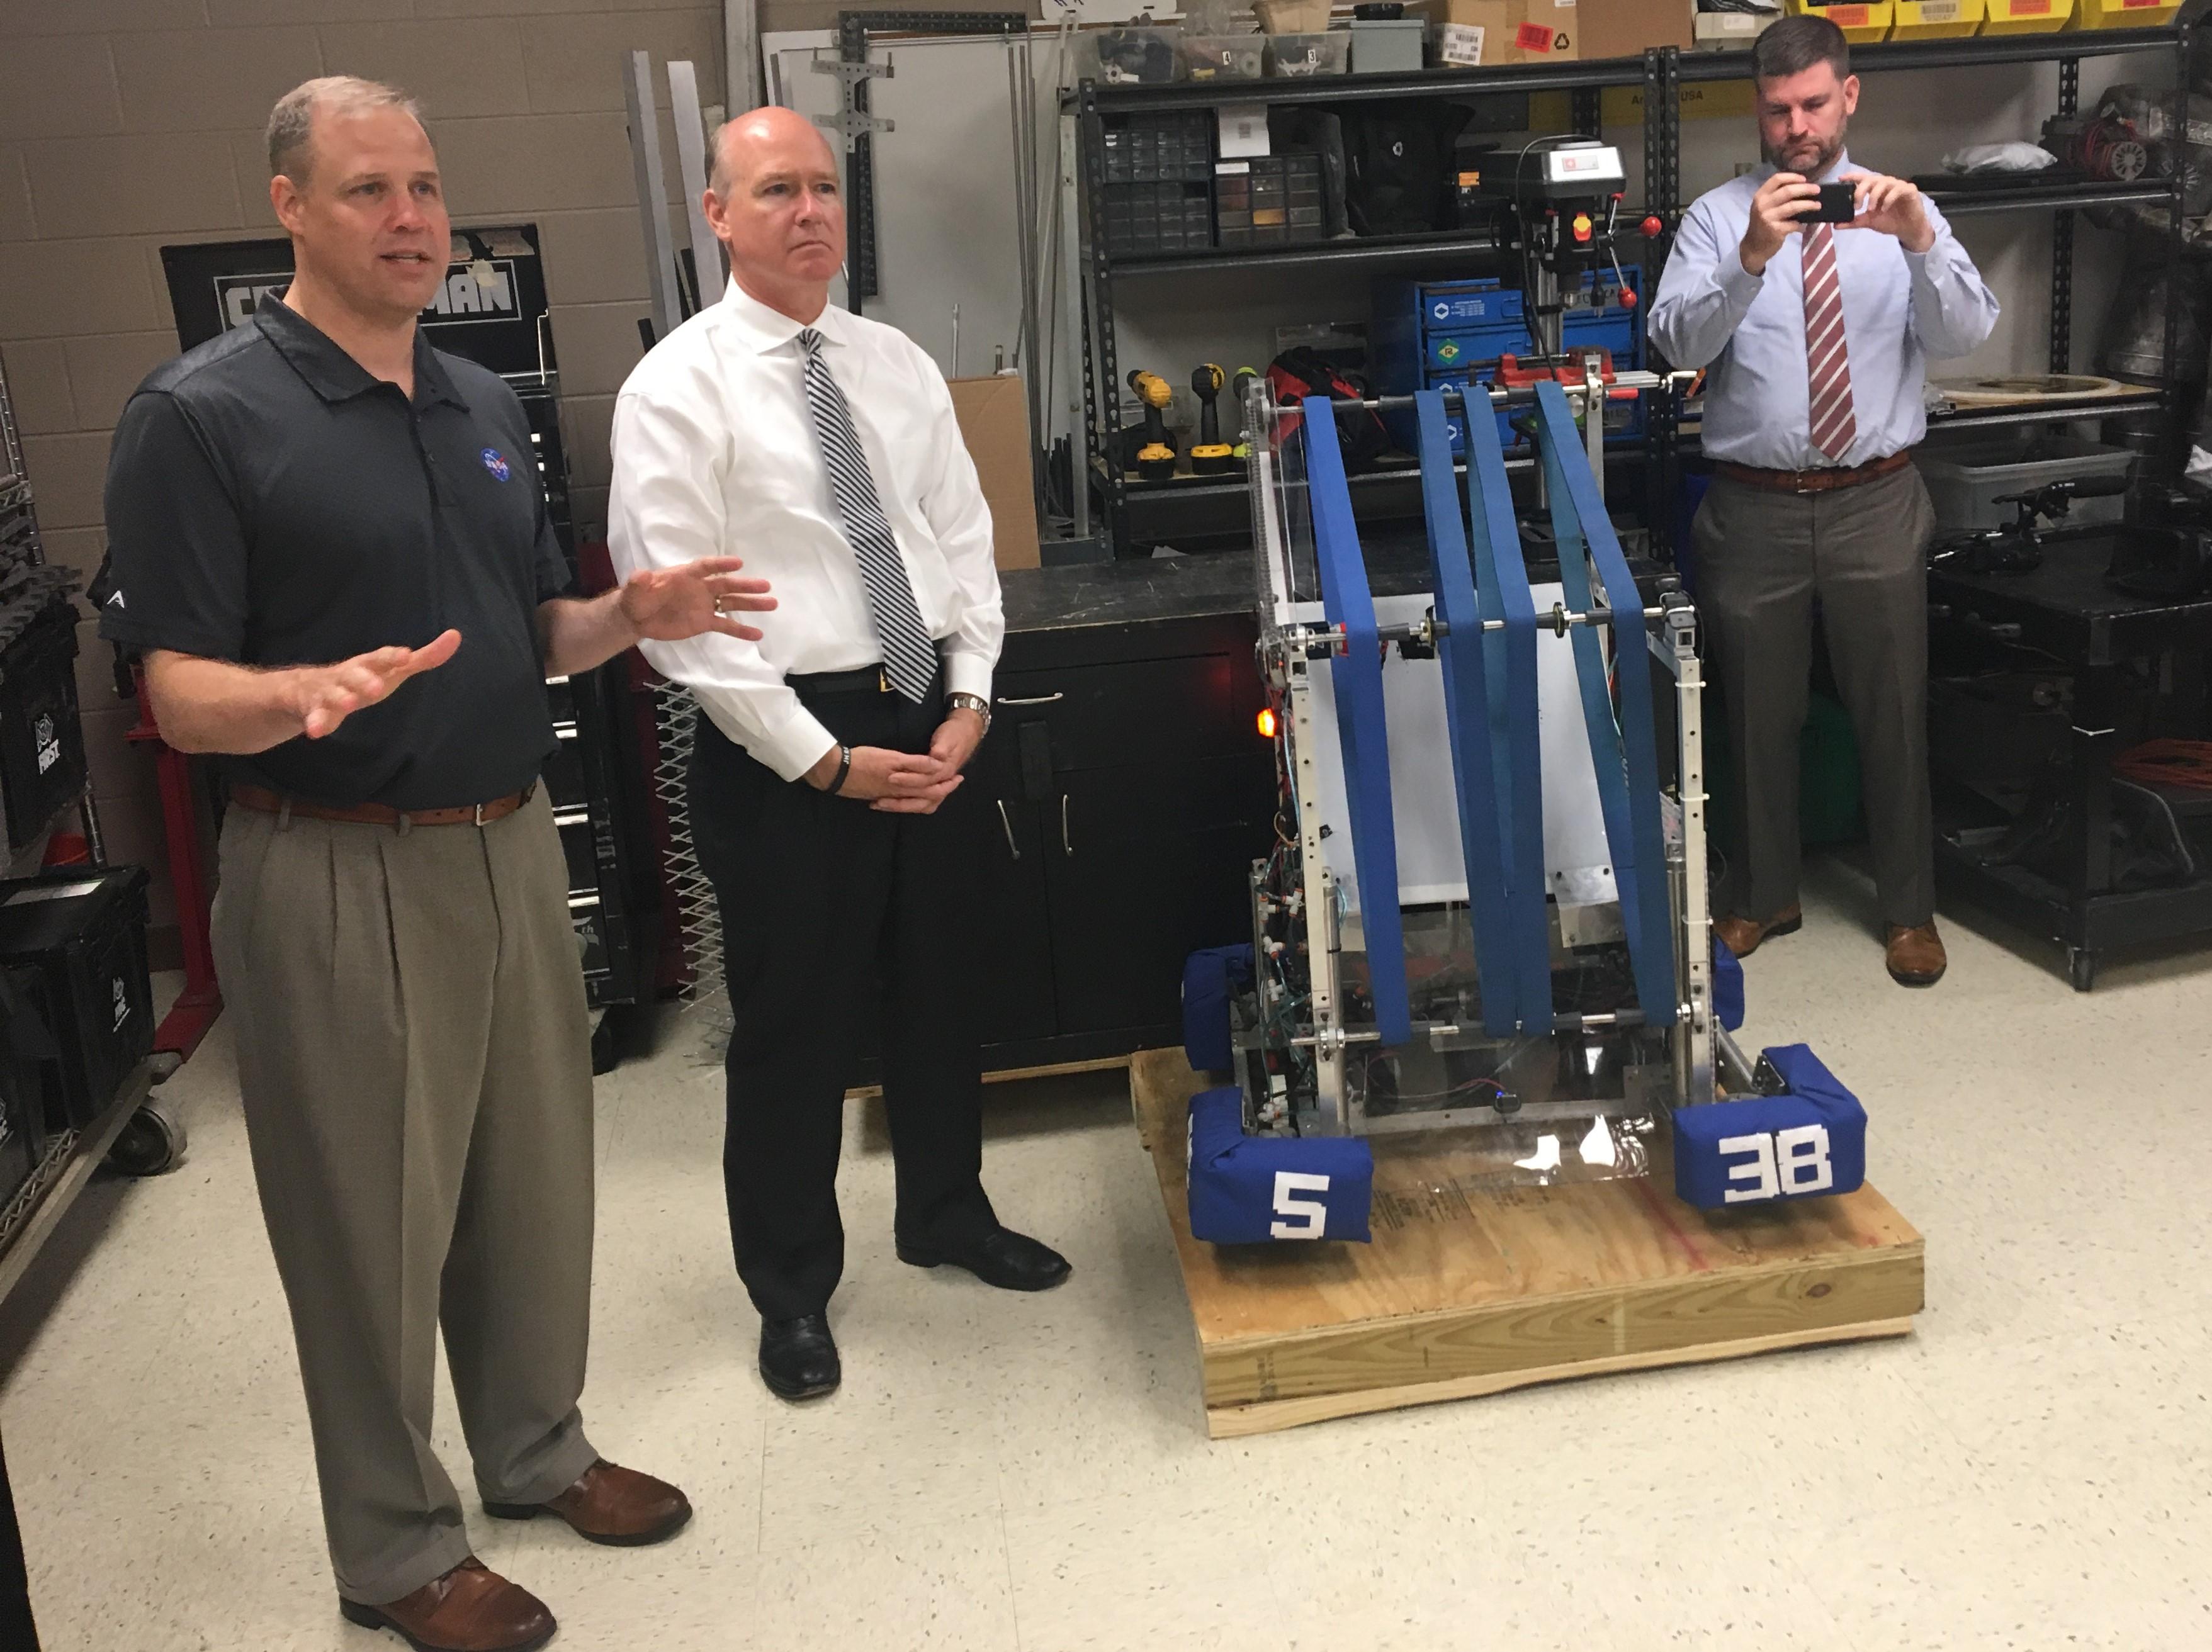 NASA boss visits Alabama school seeking brainpower for future space projects